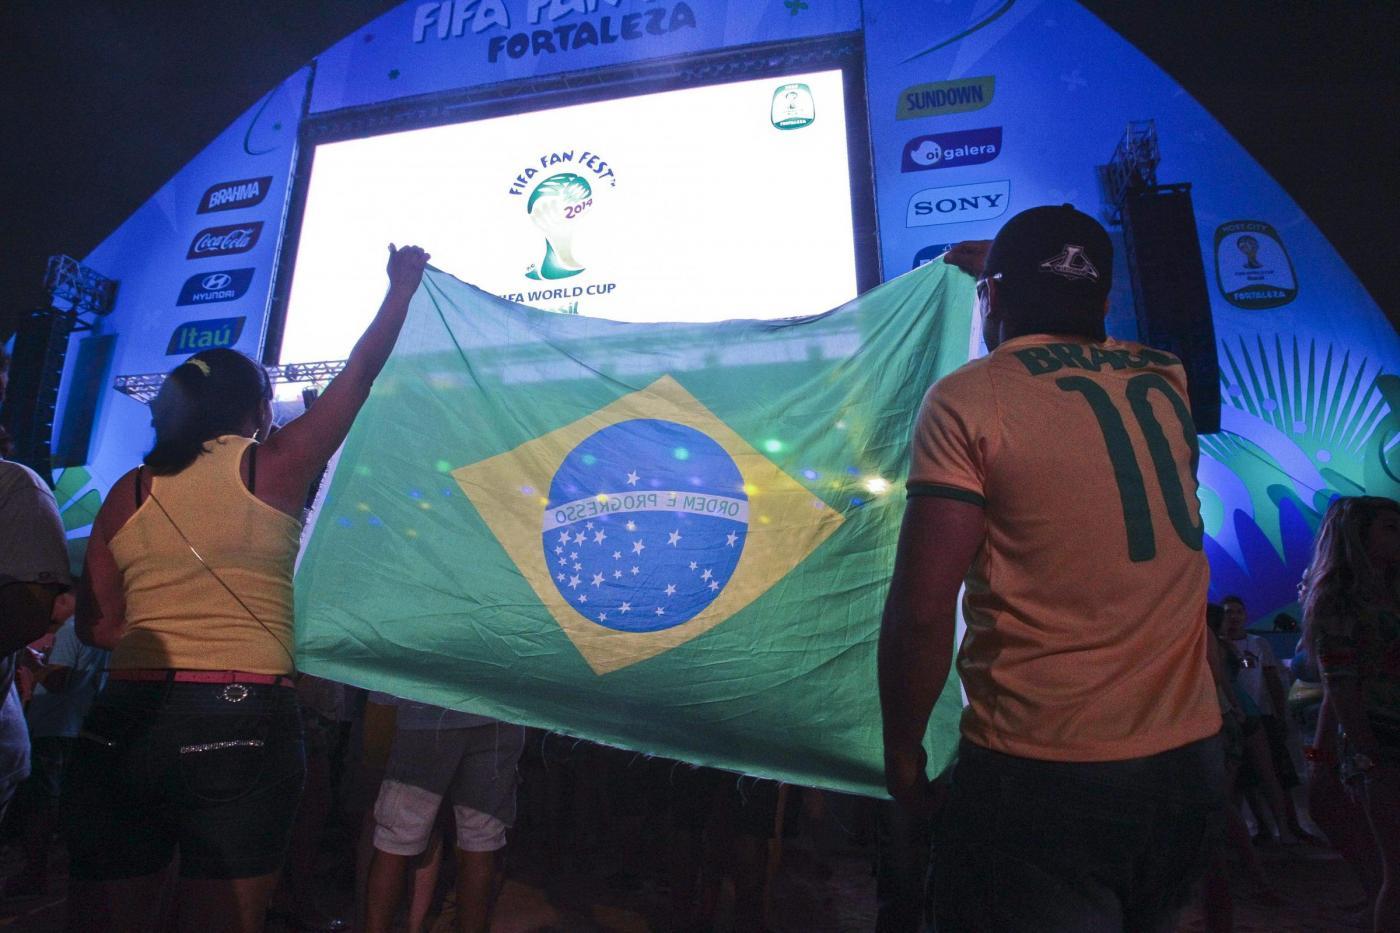 Uniclinic-Fortaleza mercoledì 17 gennaio